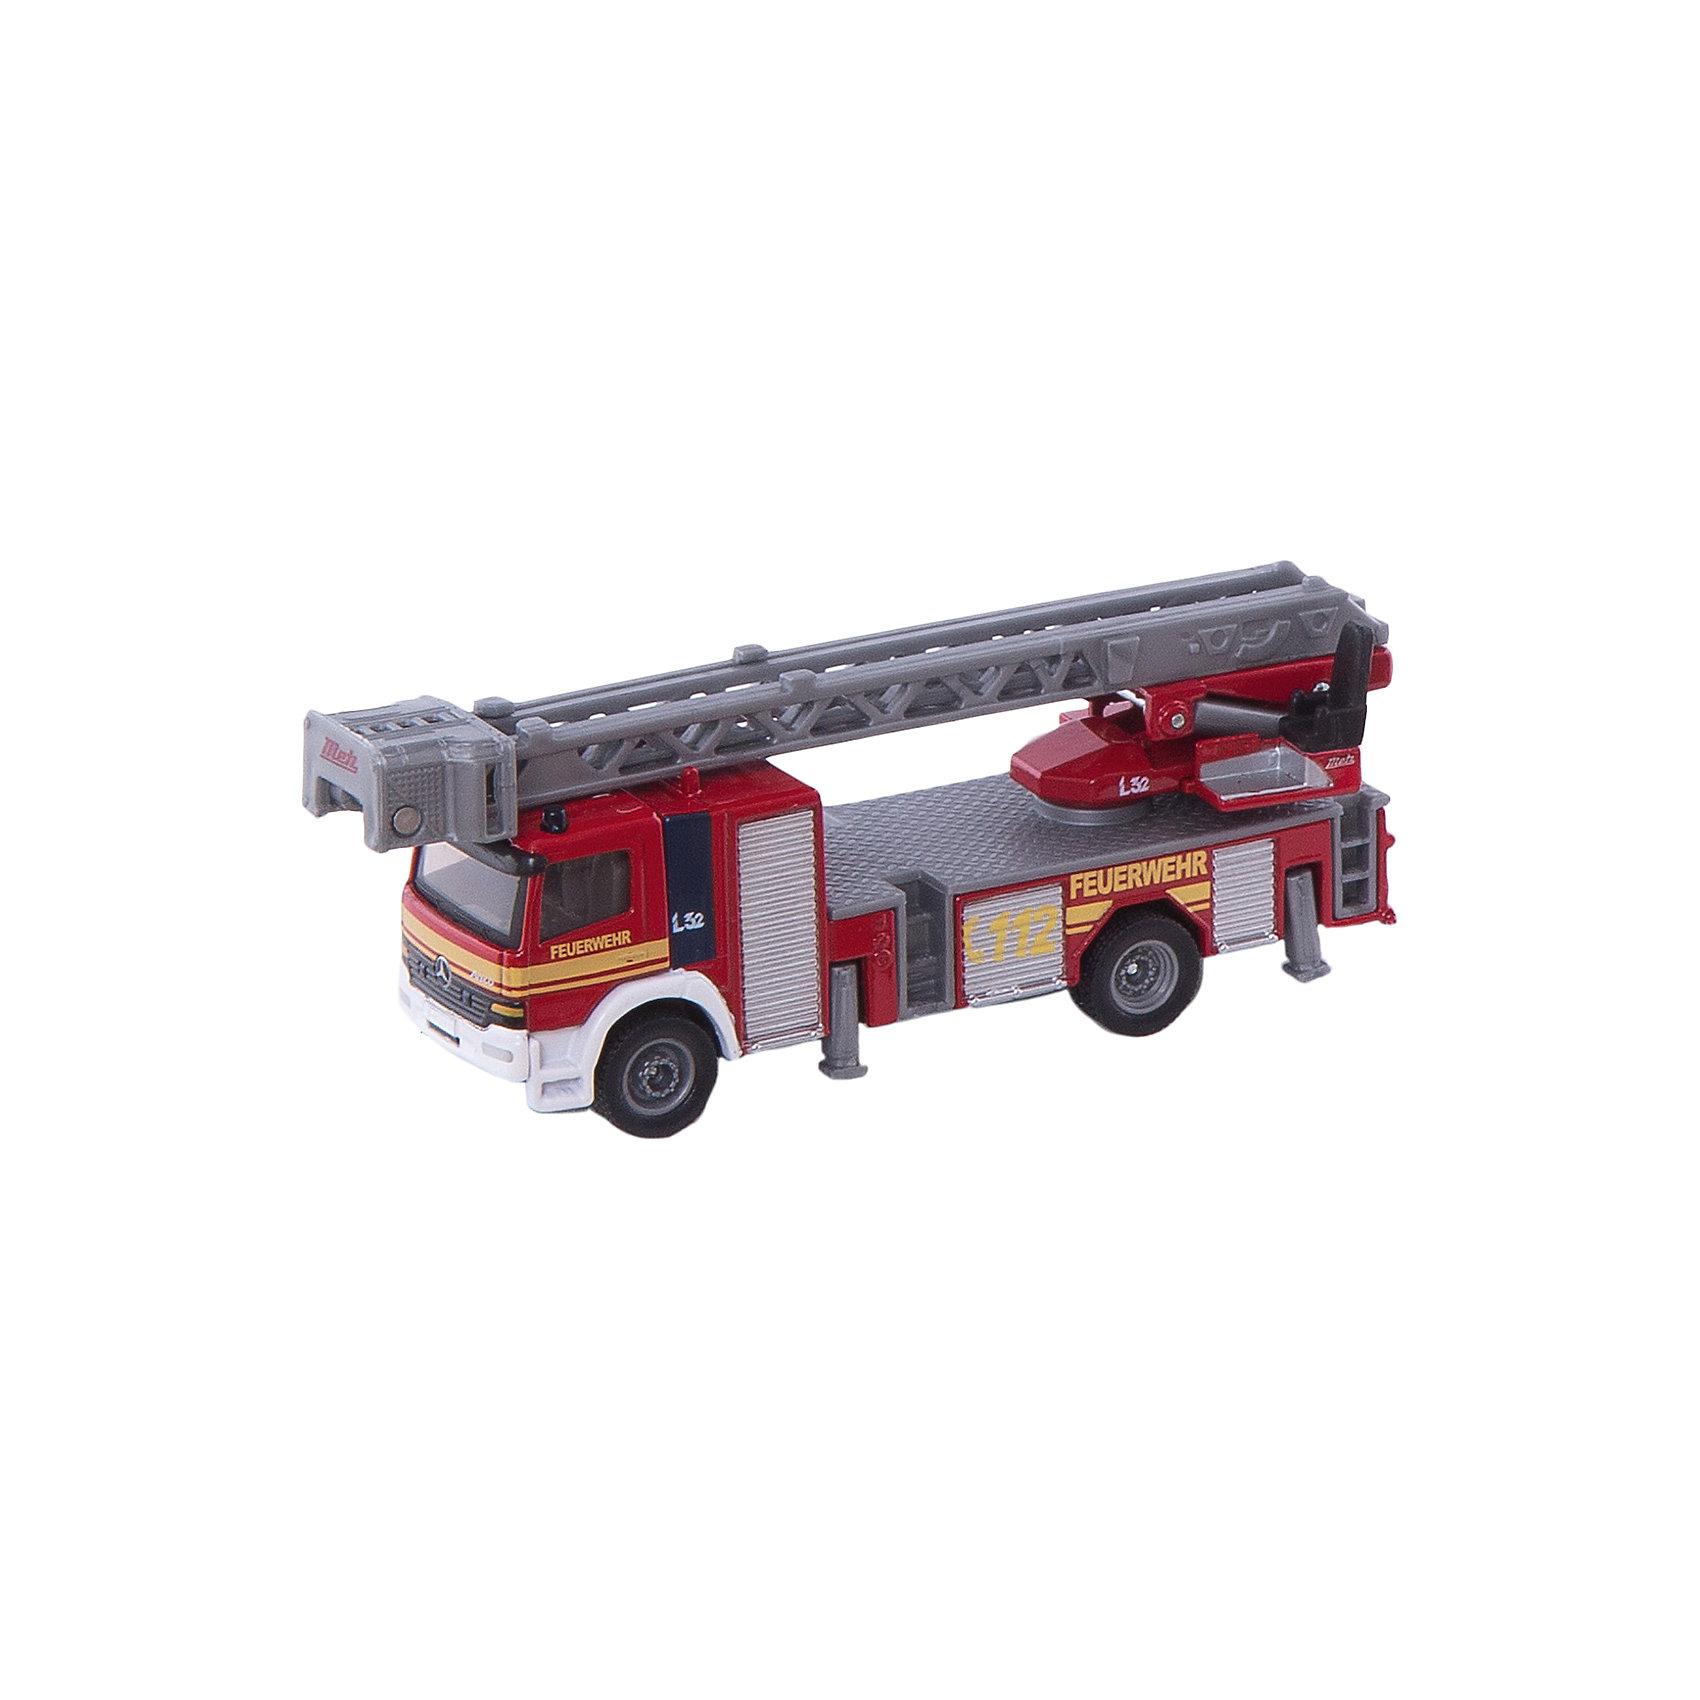 SIKU SIKU 1841 Пожарная машина с лестницей 1:87 машина пламенный мотор volvo v70 пожарная охрана 870189